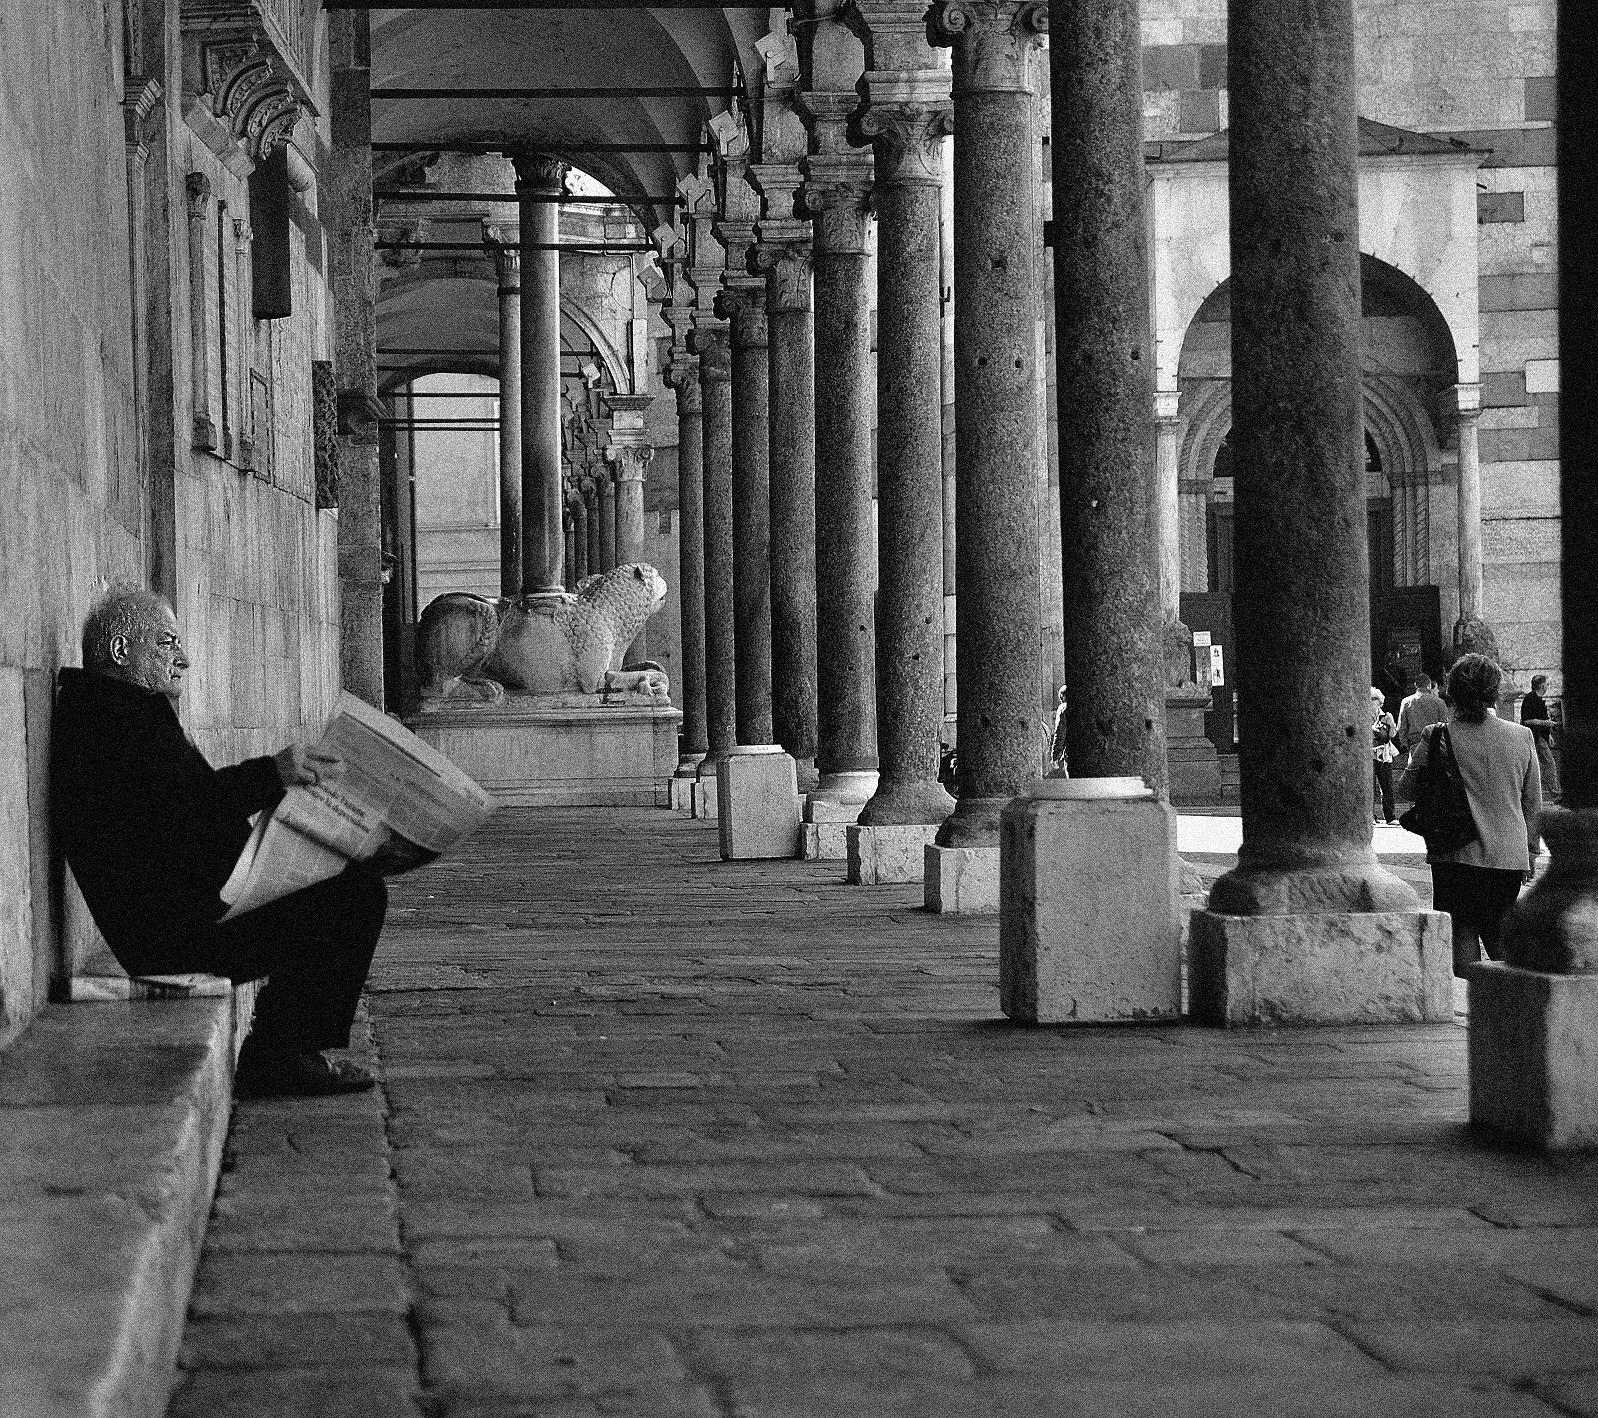 Sunday morning in Cremona...